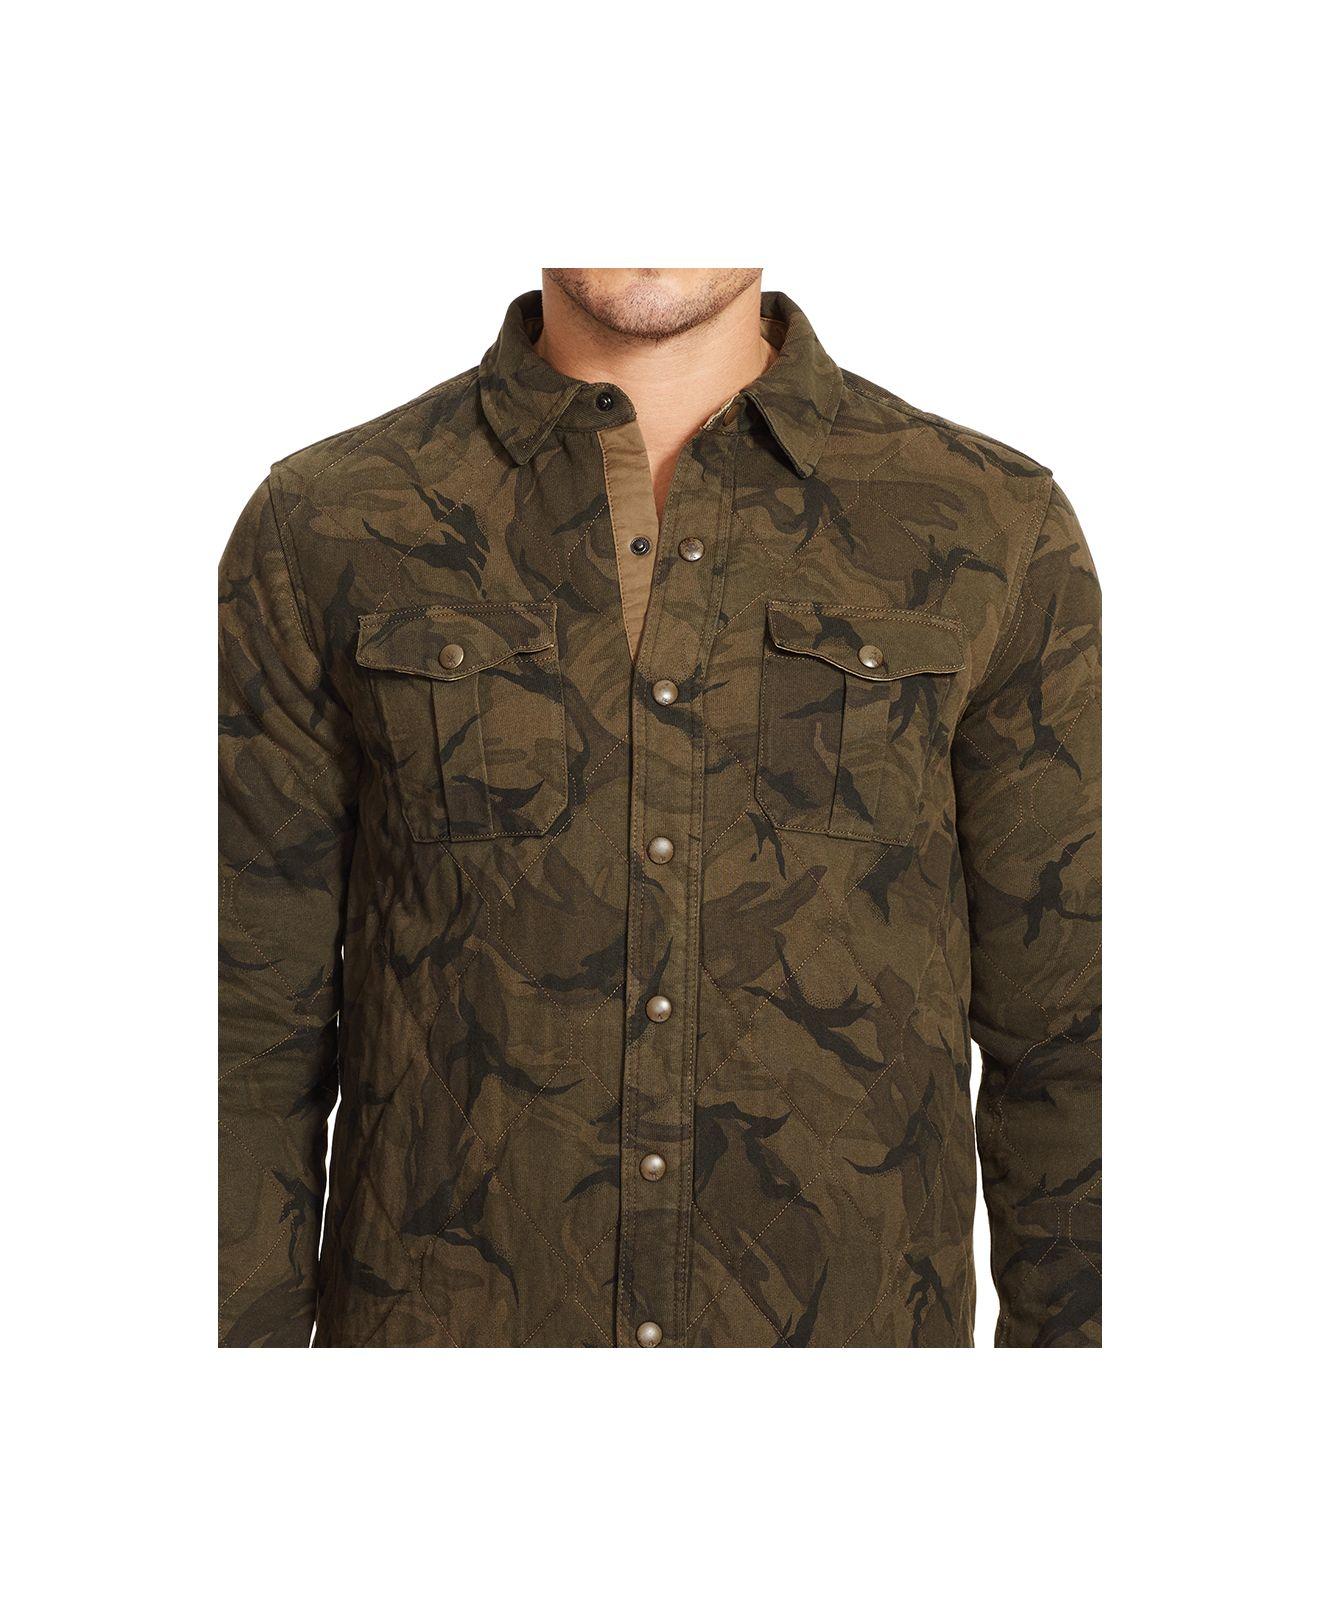 Polo ralph lauren men 39 s camo military shirt in green for for Camo polo shirts for men